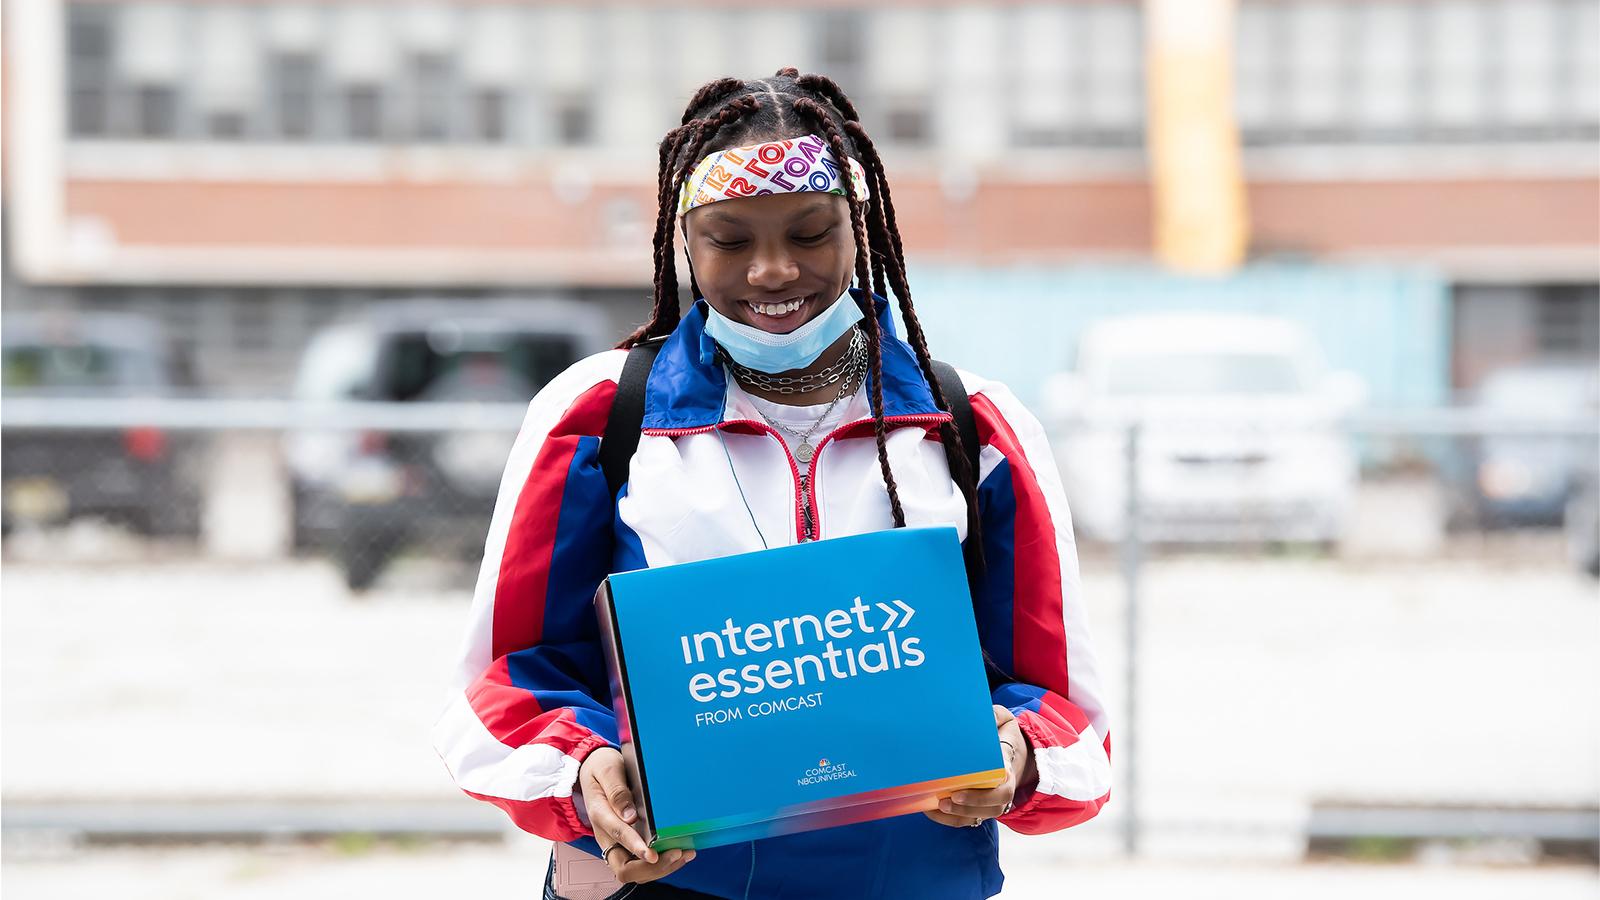 Comcast Internet Essentials - Strawberry Mansion High School Giveaway